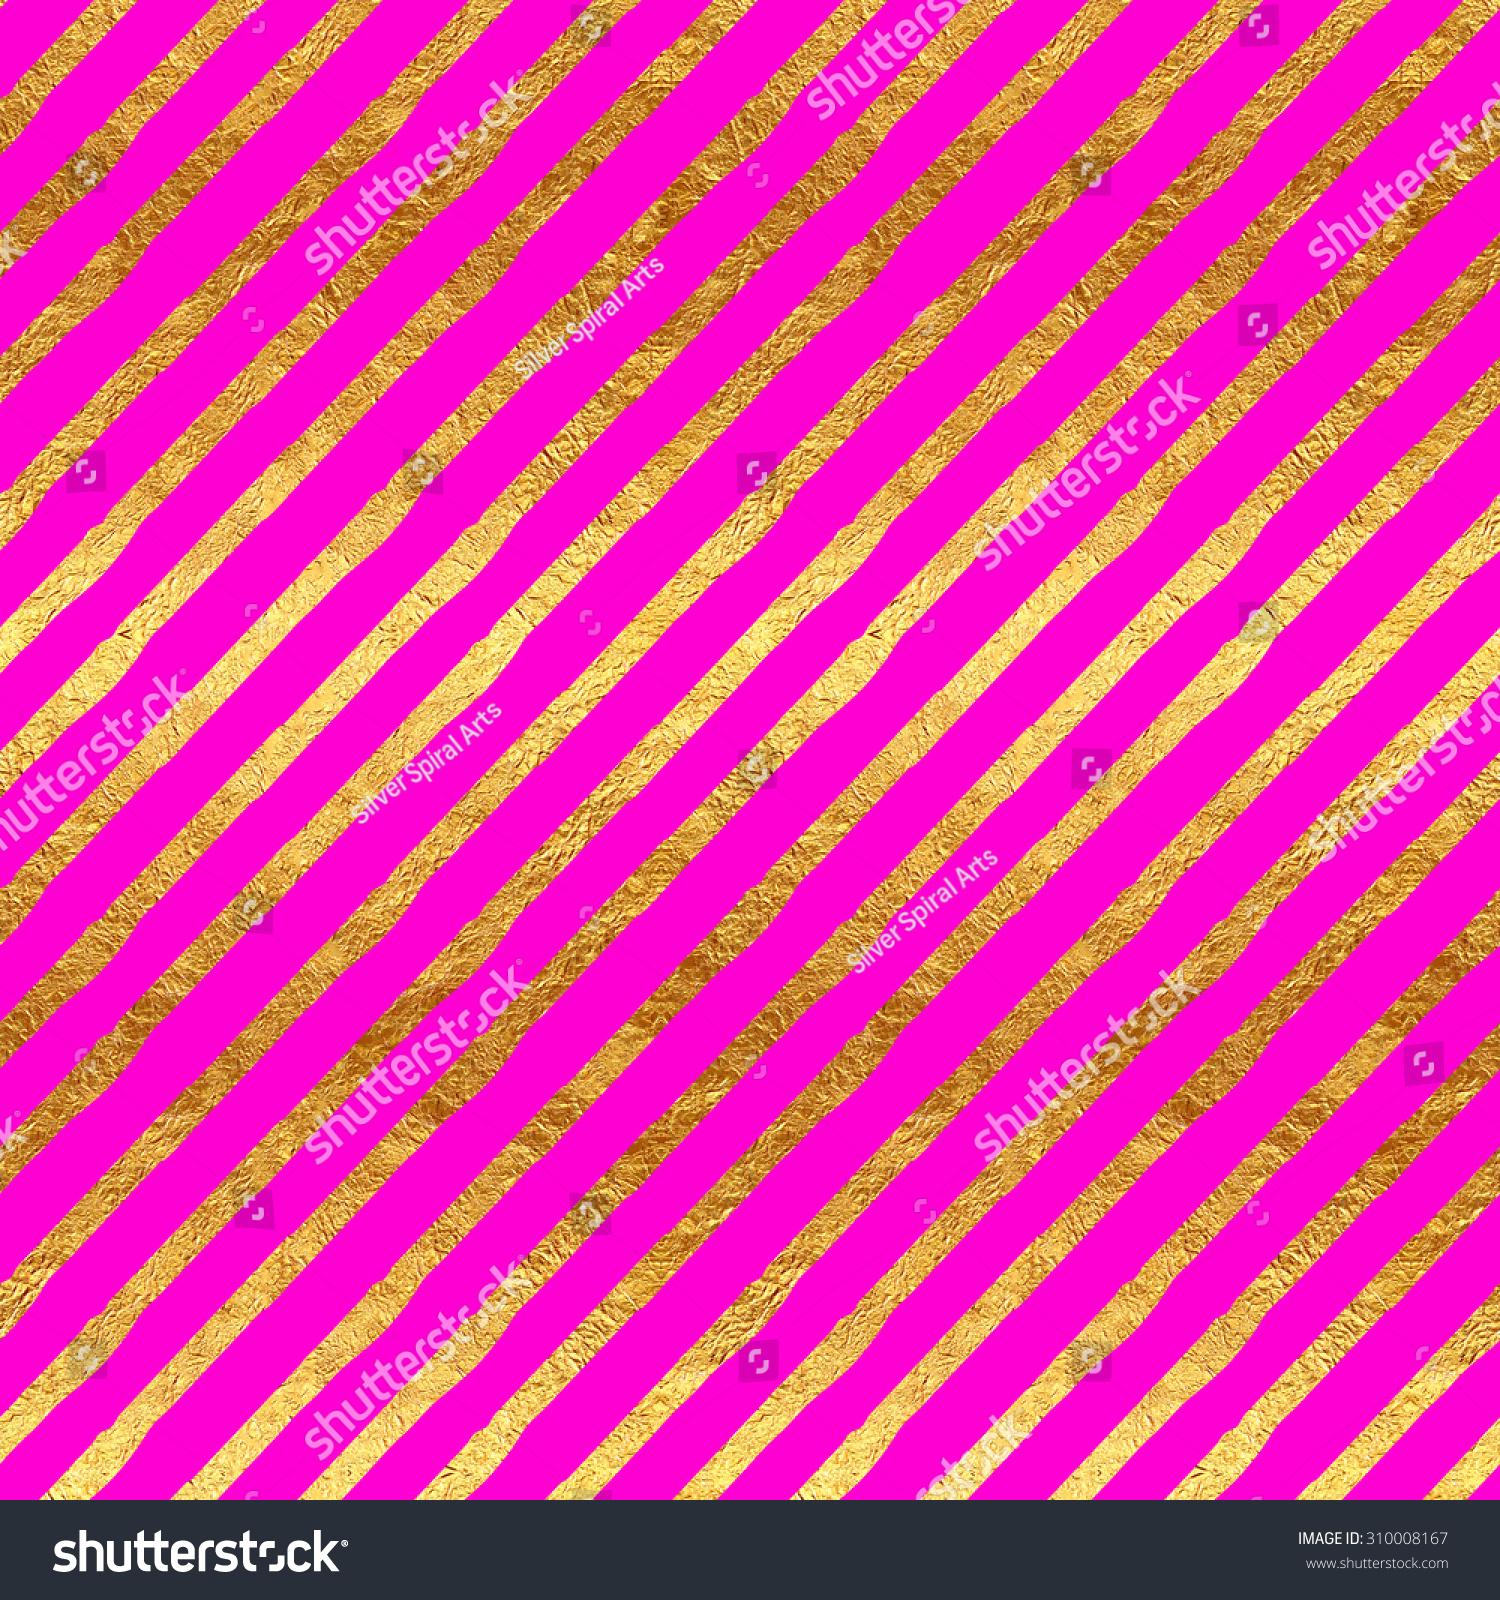 Gold Faux Foil Metallic Stripes Hot Stock Photo 310008167 ...